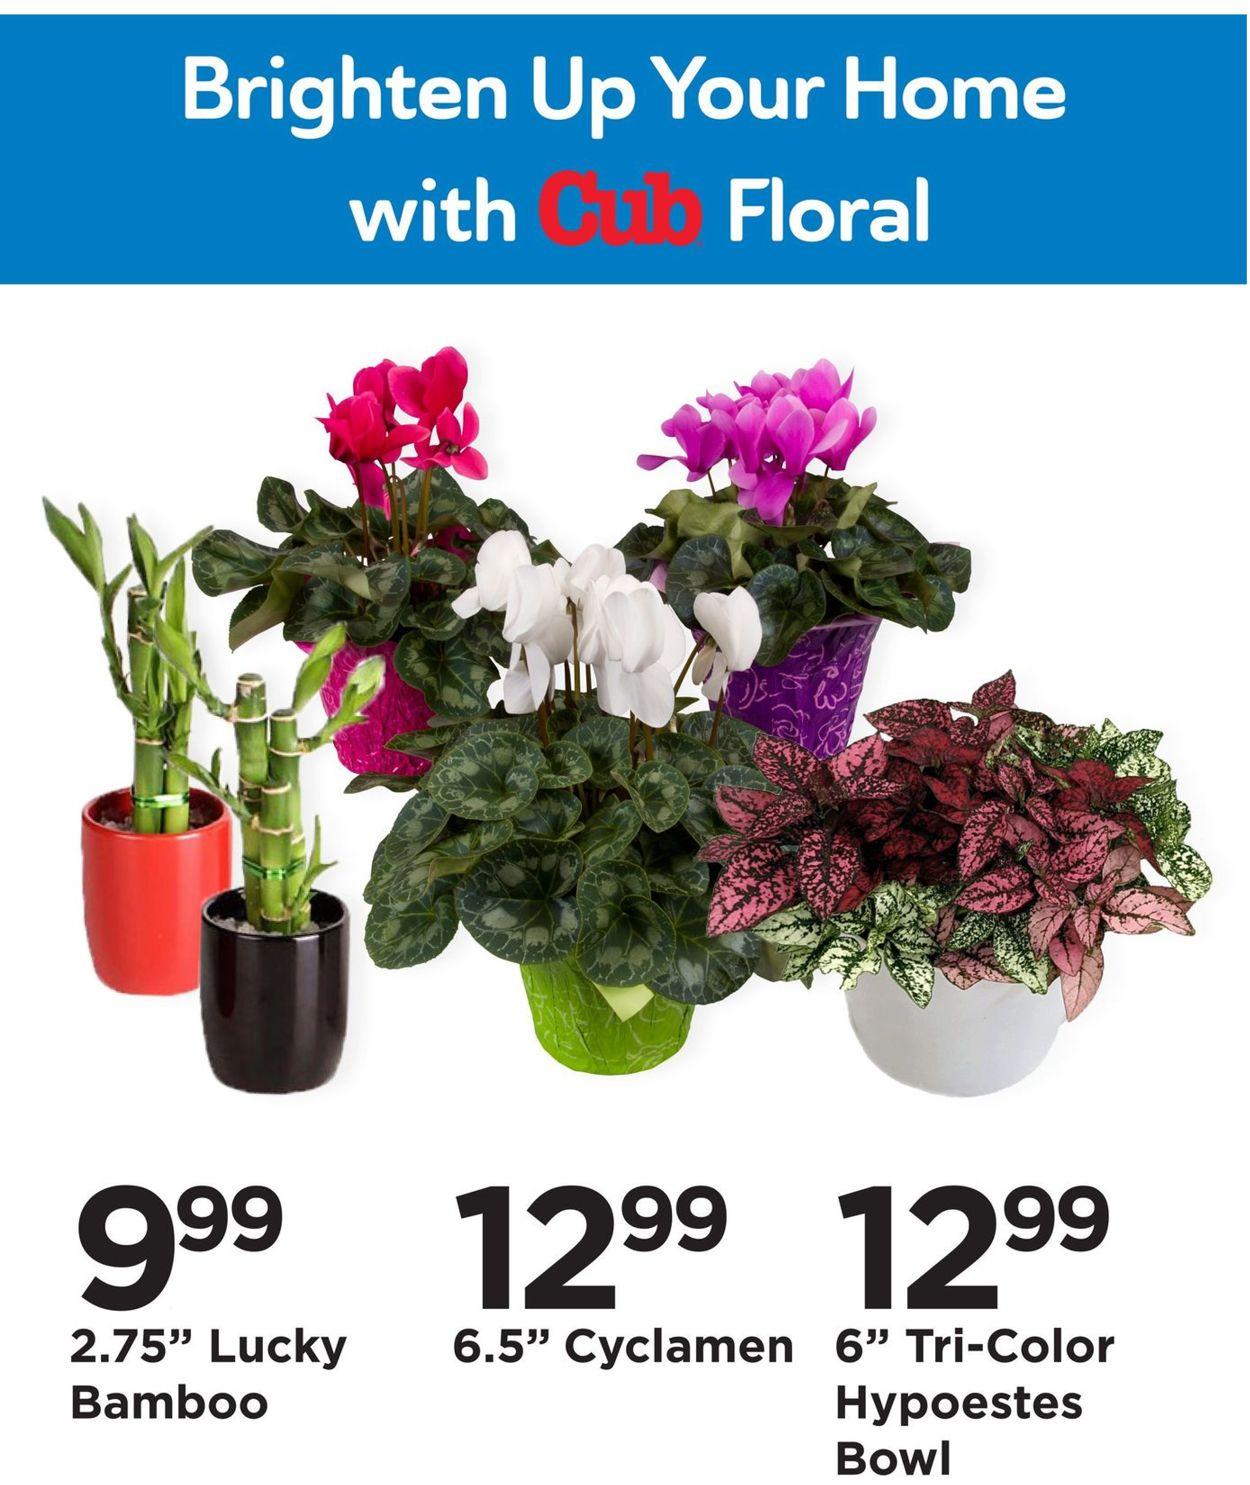 Cub Foods Floral Department 2021 Weekly Ad Circular - valid 01/31-02/06/2021